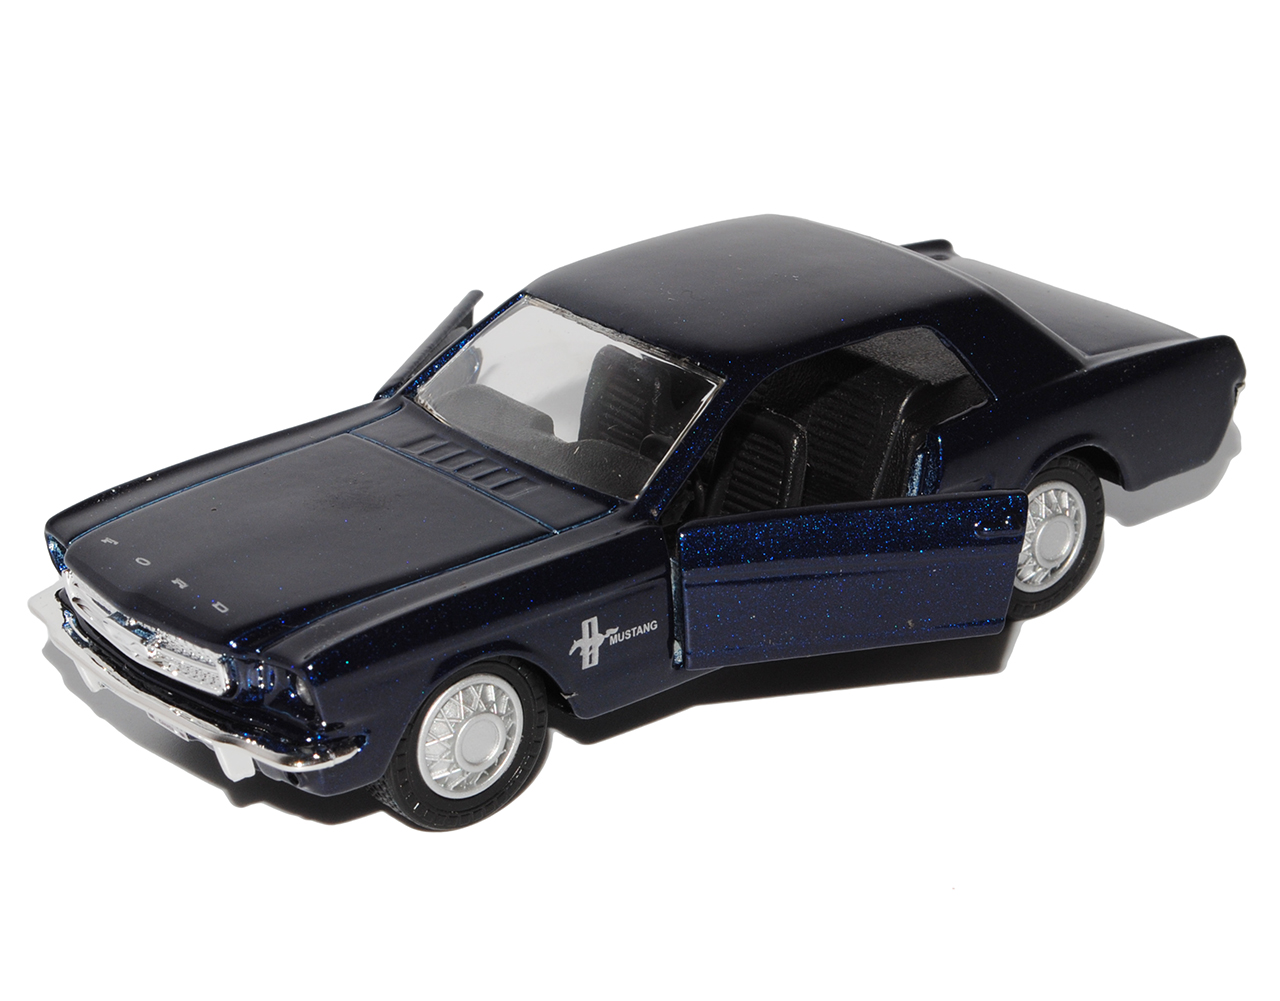 Ford-Mustang-1964-Coupe-1-Generation-azul-oscuro-casi-negro-1-43-maisto-mod miniatura 6